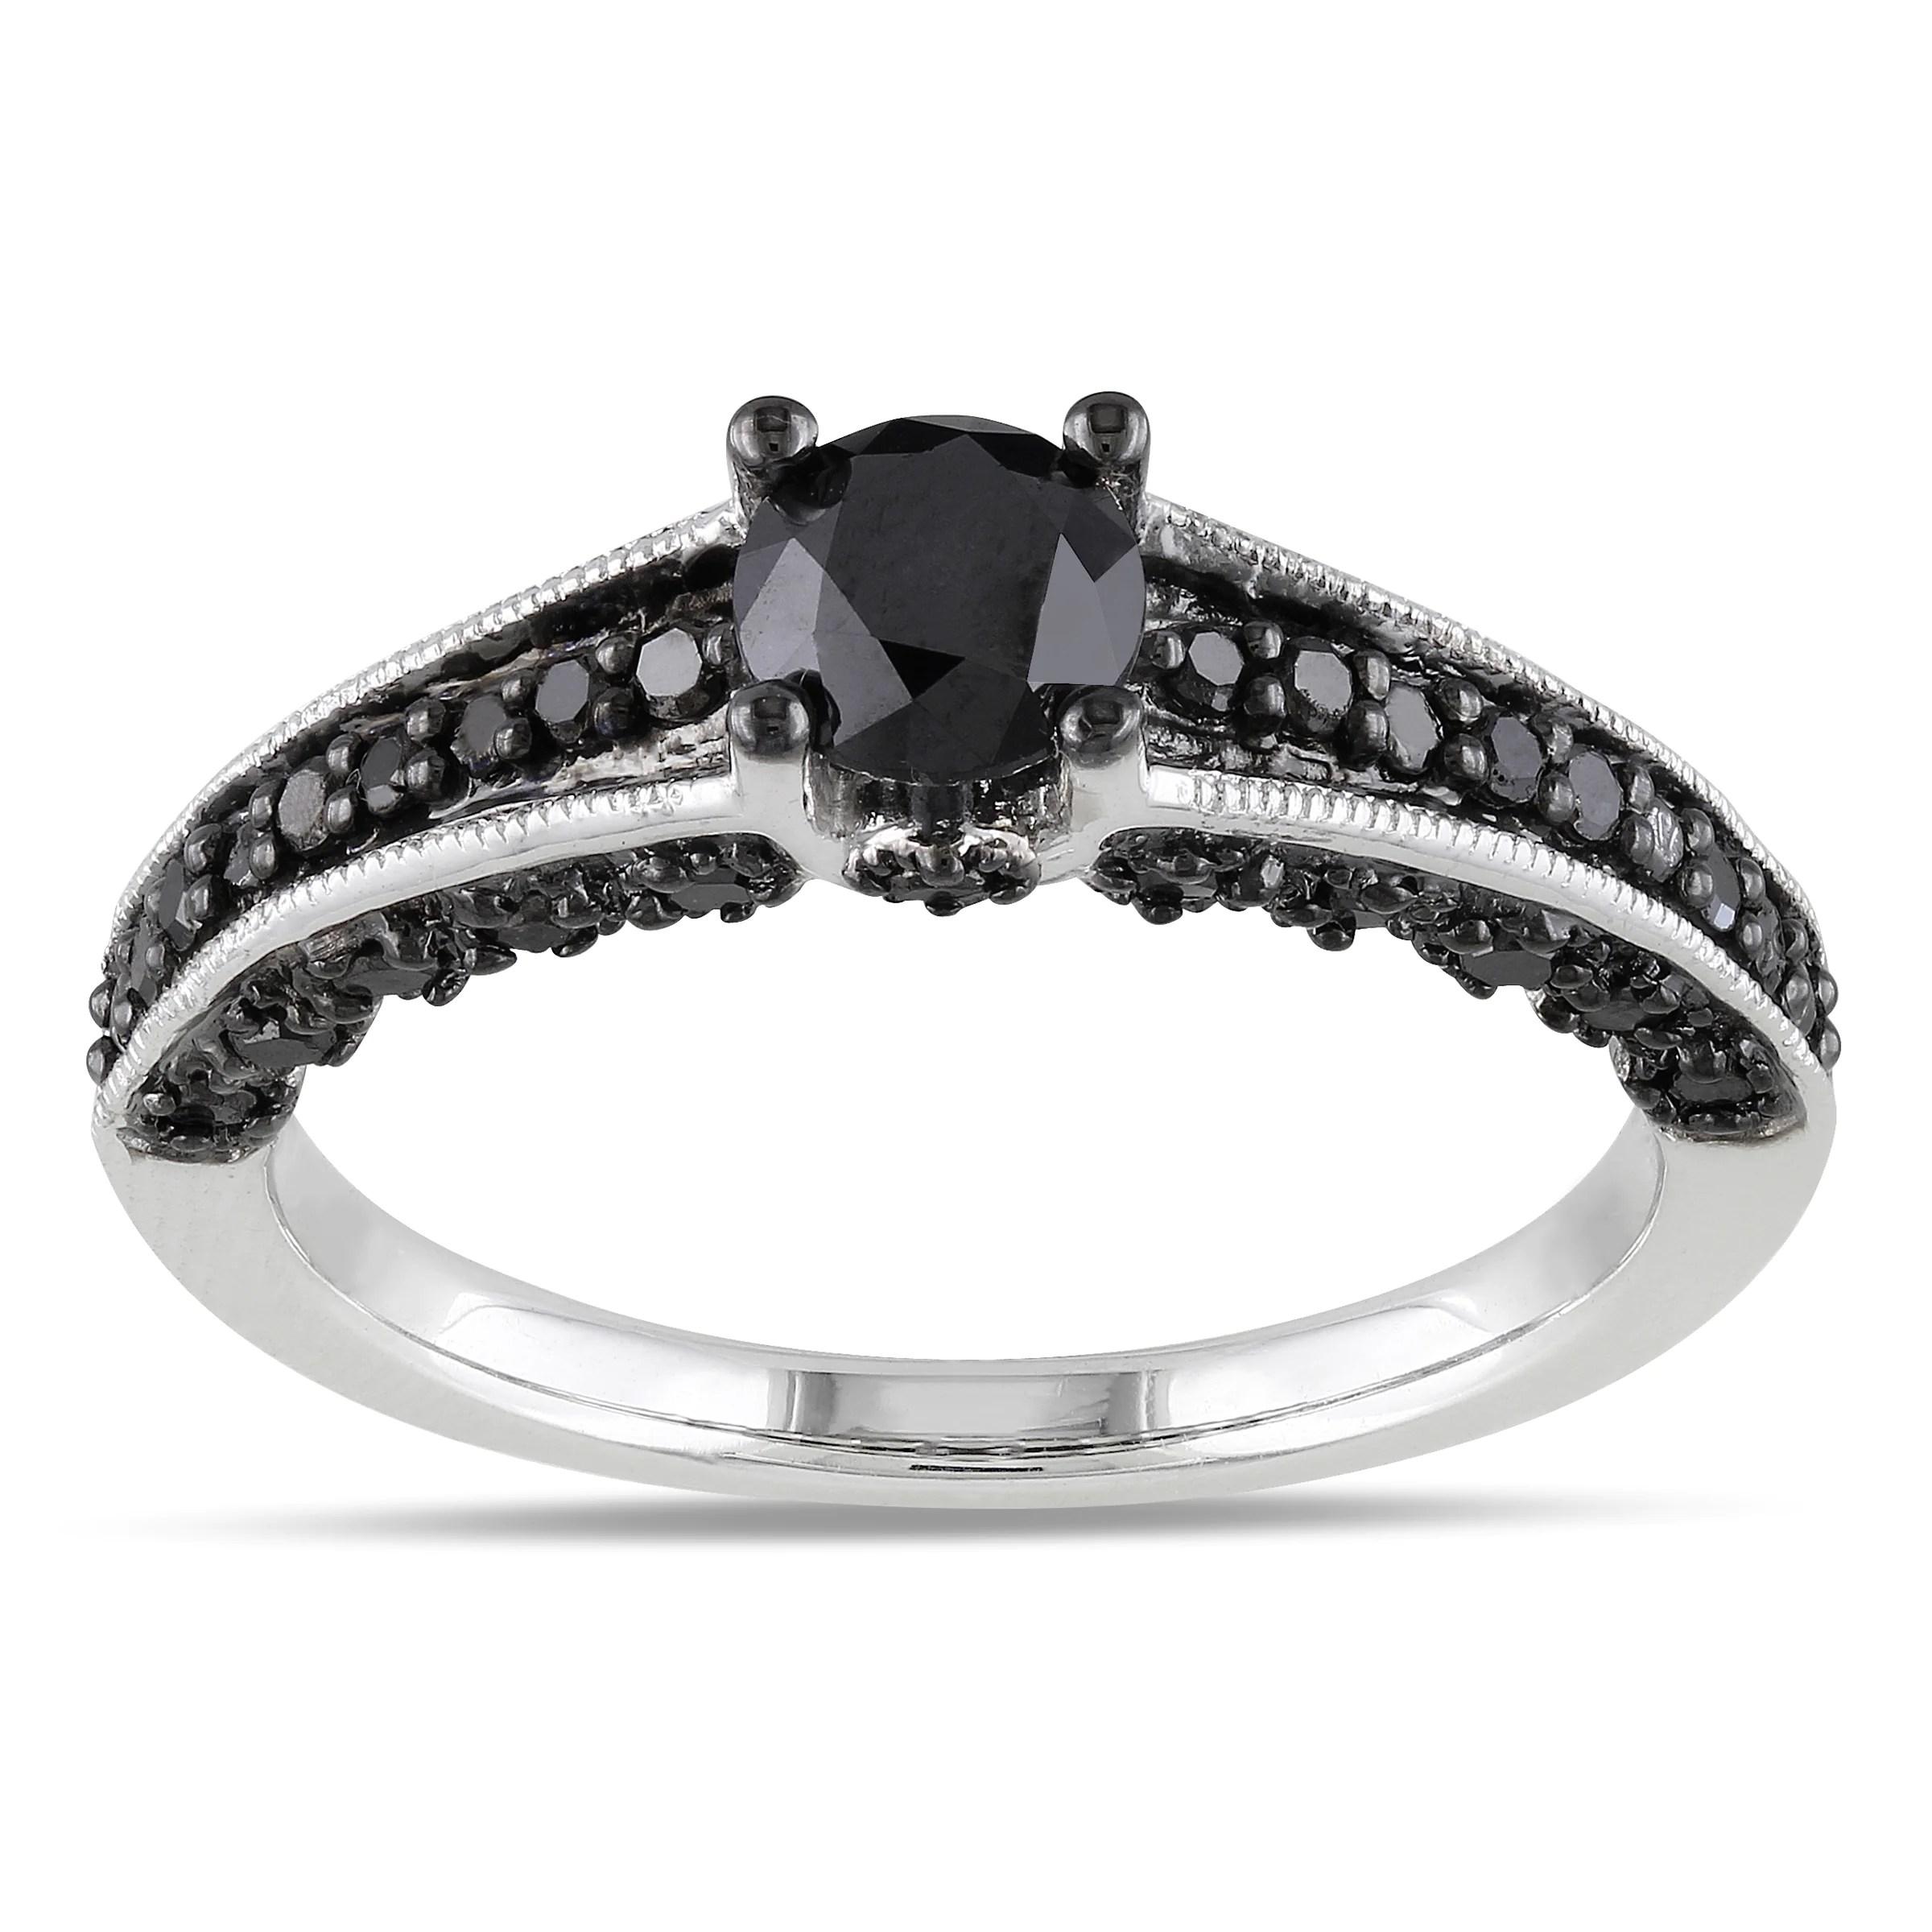 wedding rings black diamonds overstock wedding rings fabulous wedding rings black diamonds 13 about amazing design